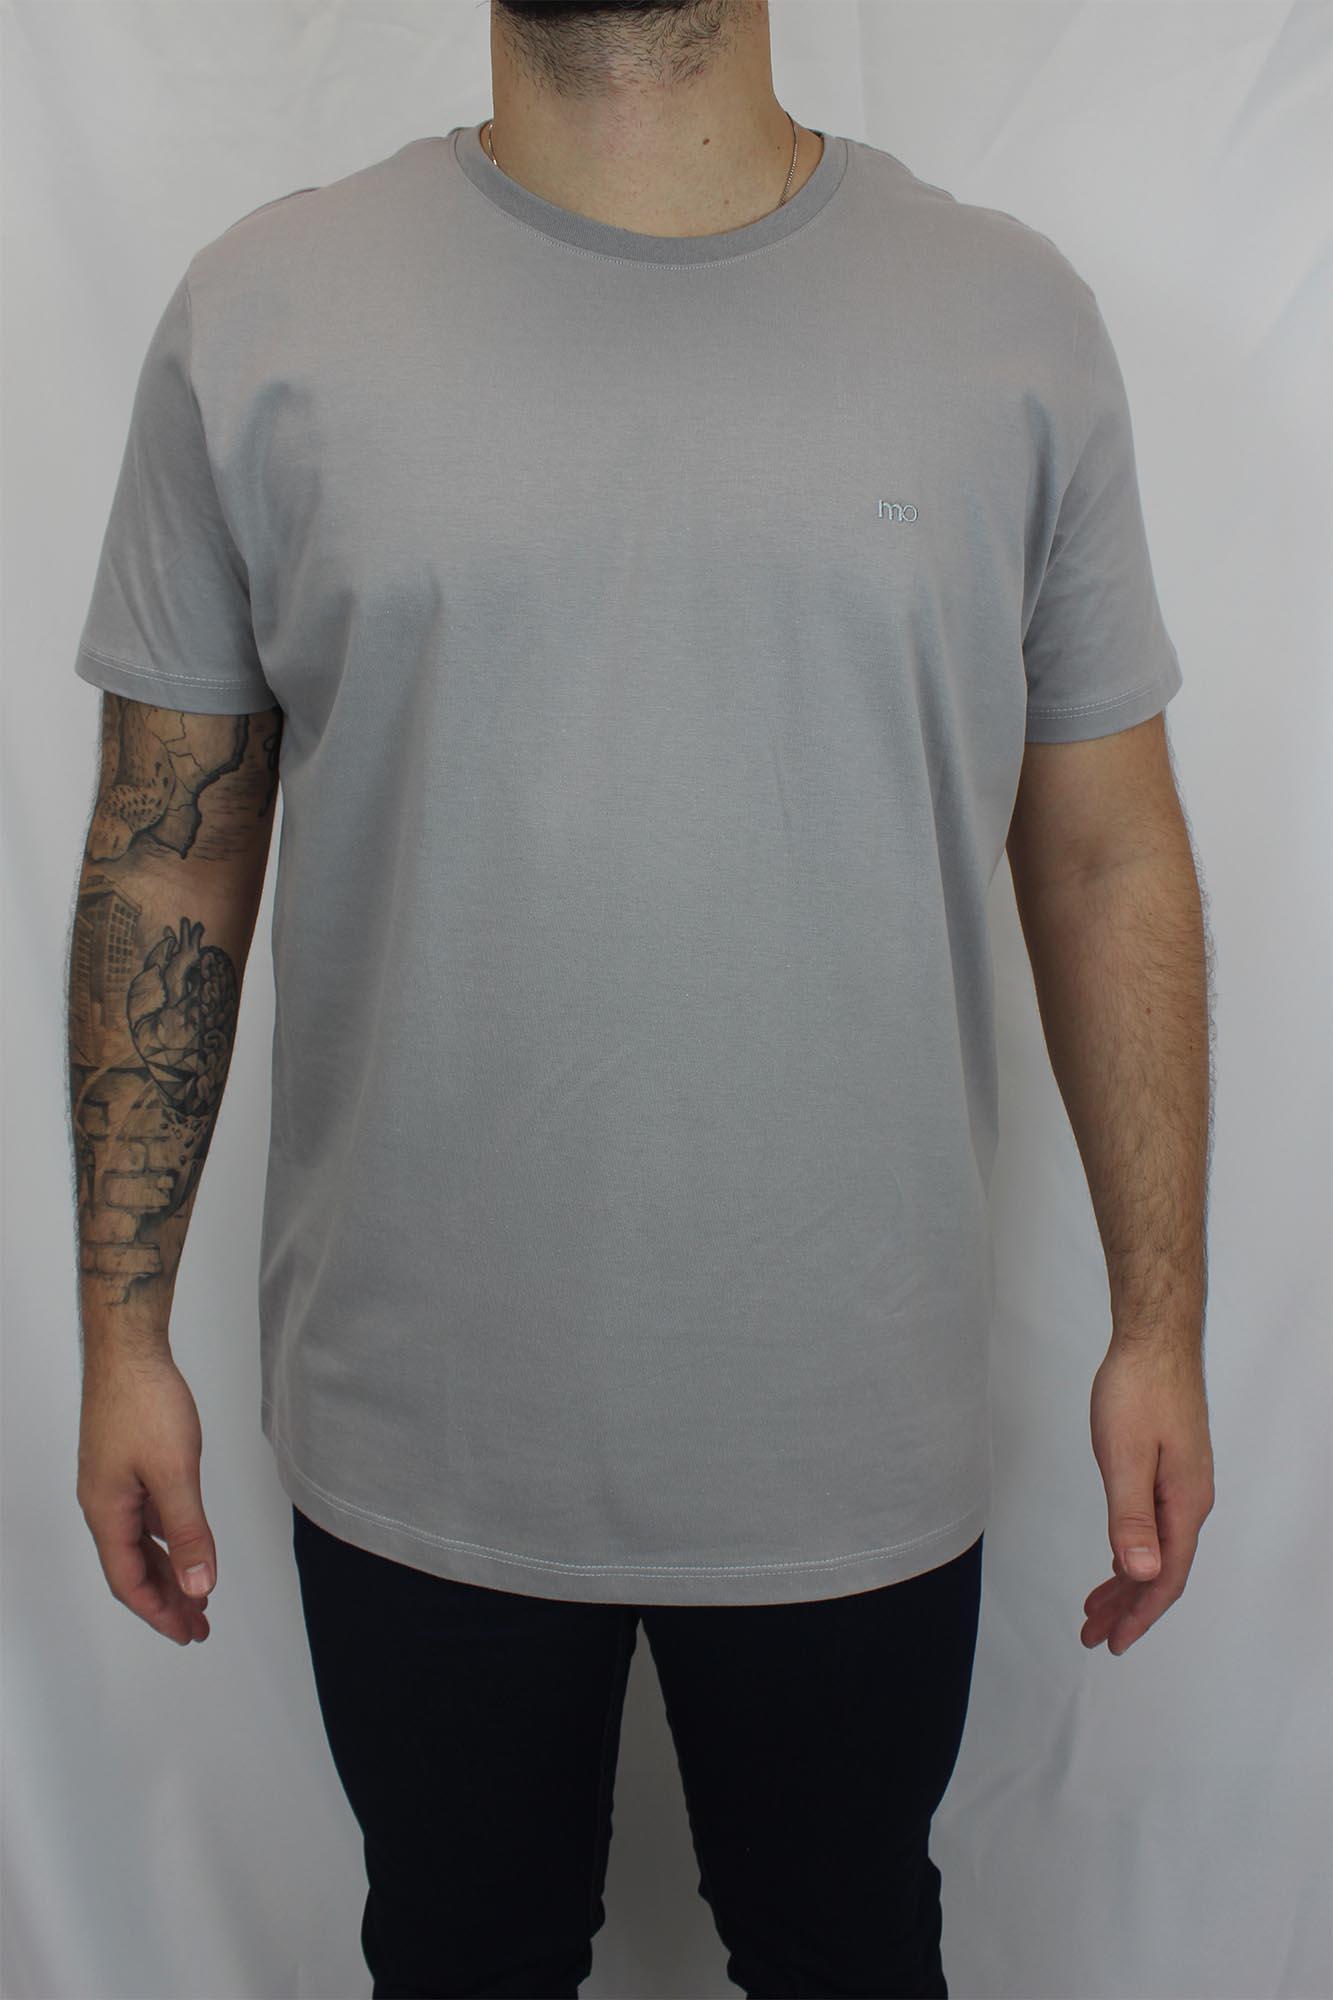 Camiseta Básica Lisa Gola Redonda MO Masculina - Cinza